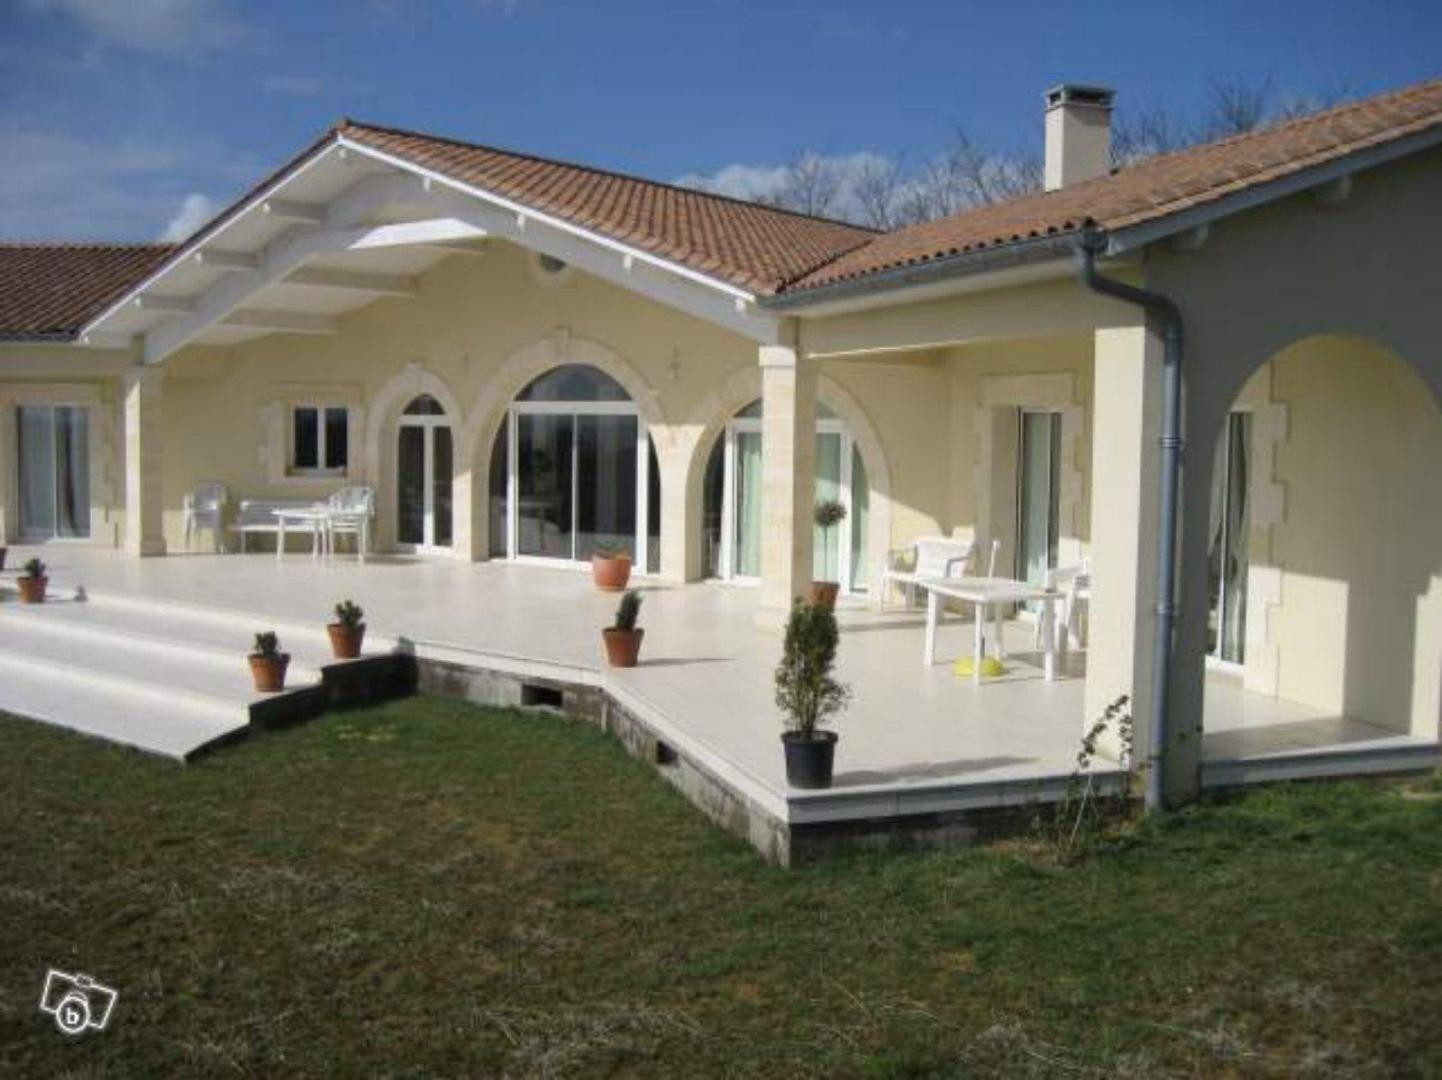 Maison neuves gallery of maison neuve ballanmir uac with for Budget construction maison neuve